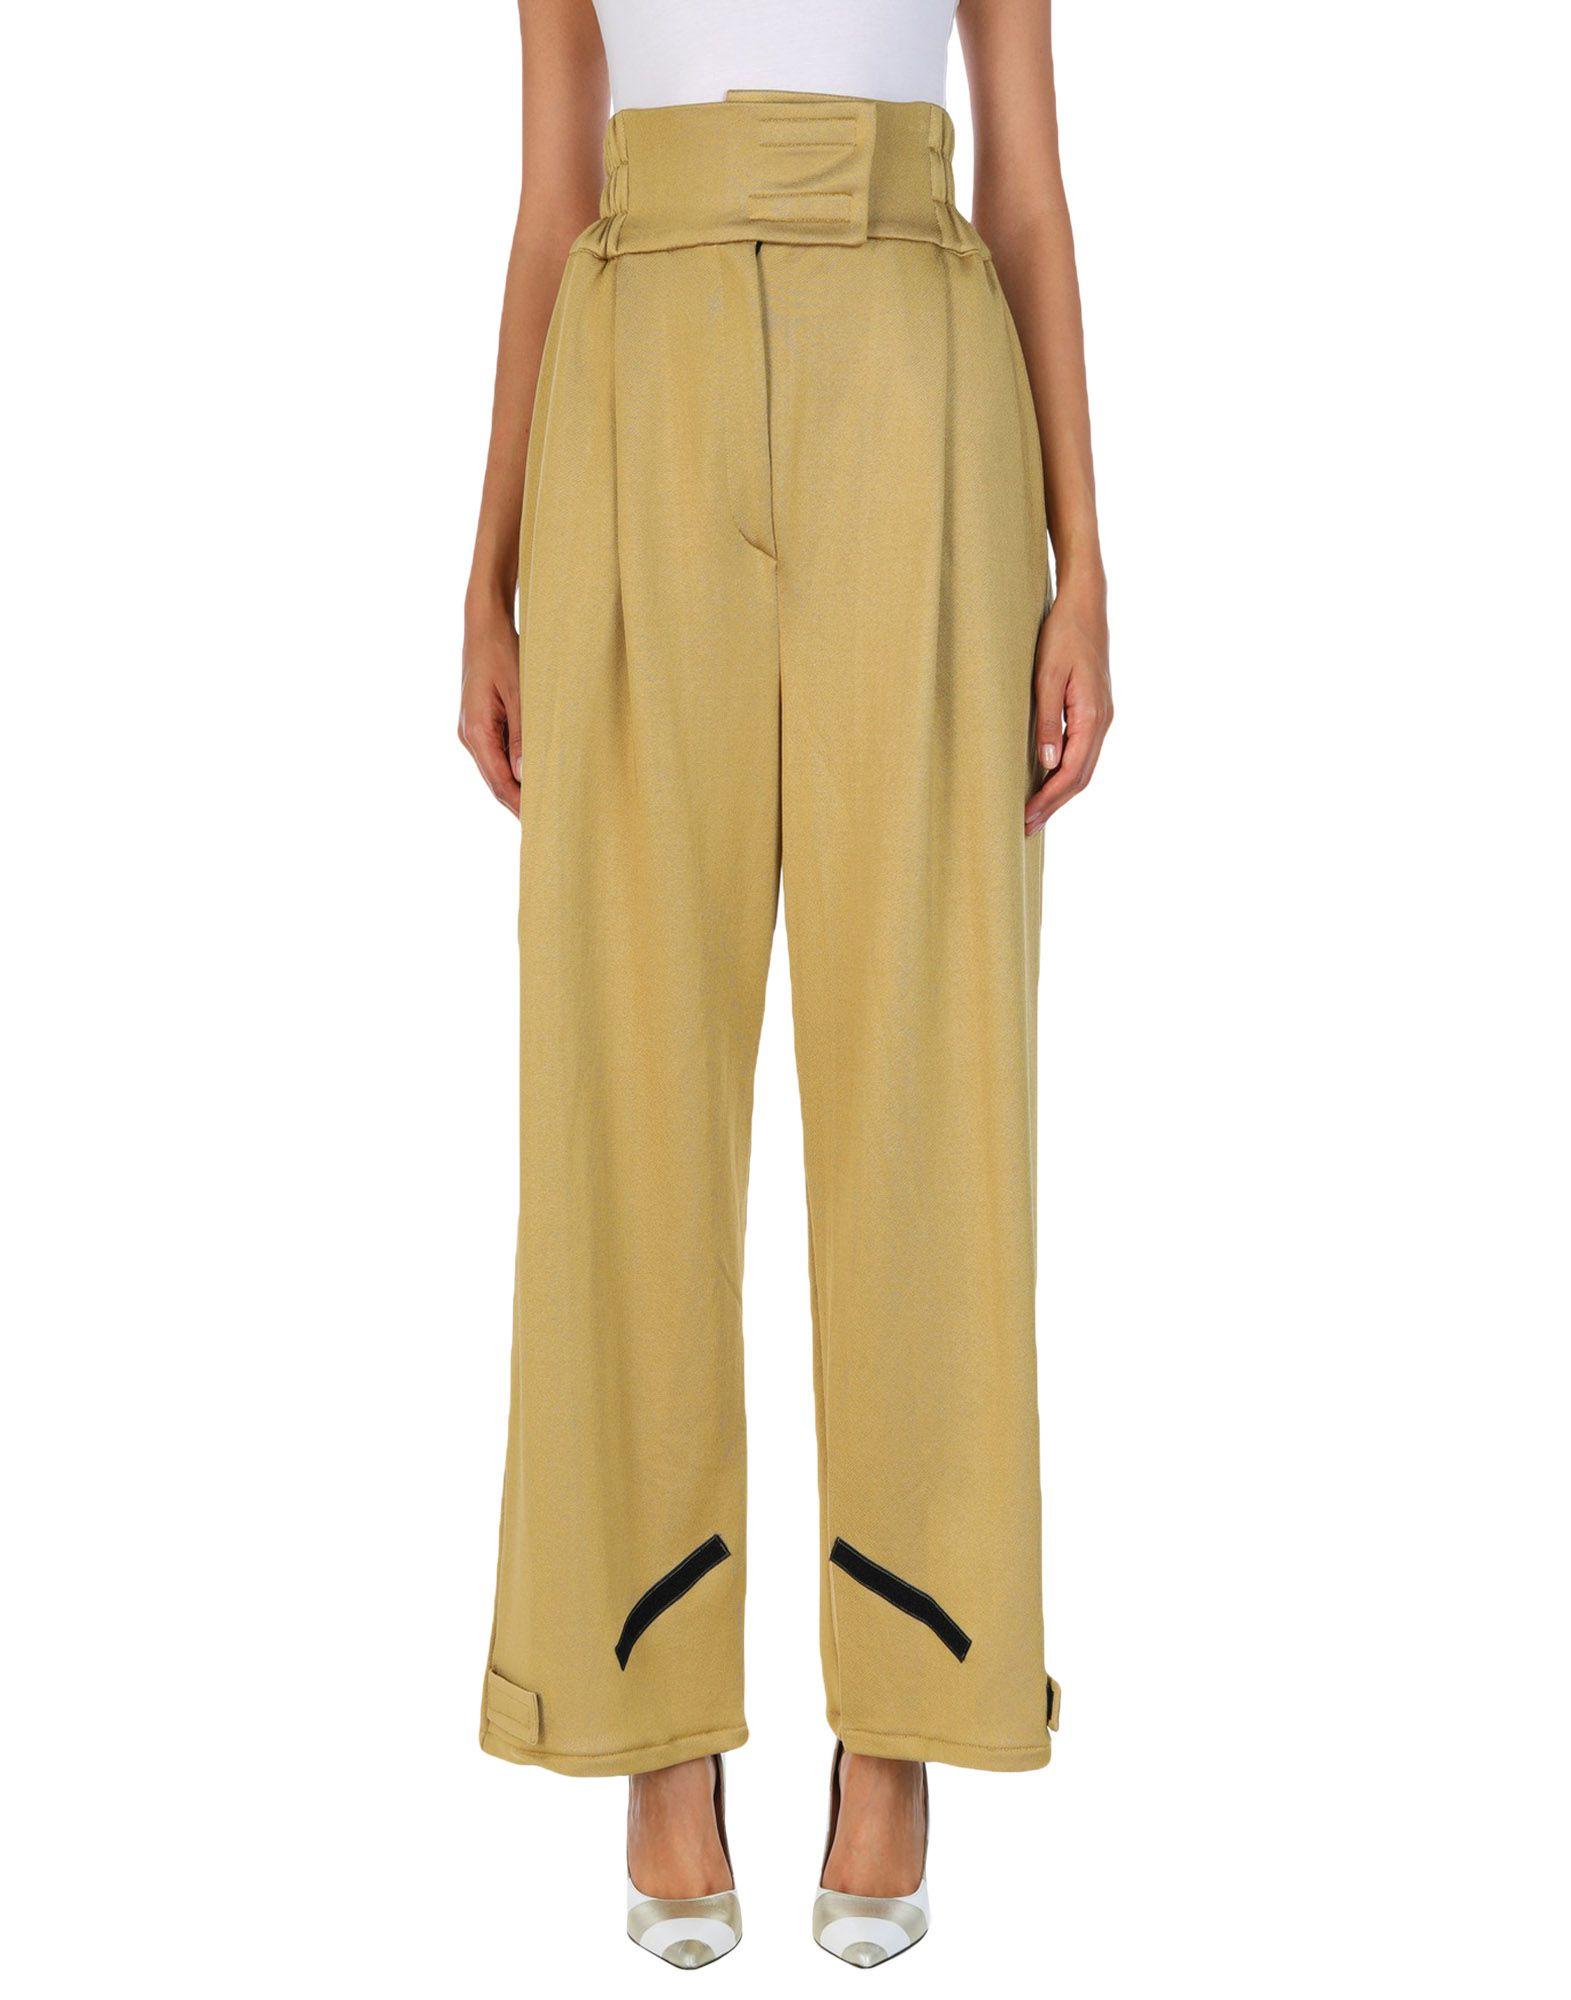 Pantalone 42 54 Fortytwo Fiftyfour damen - 13244024UH